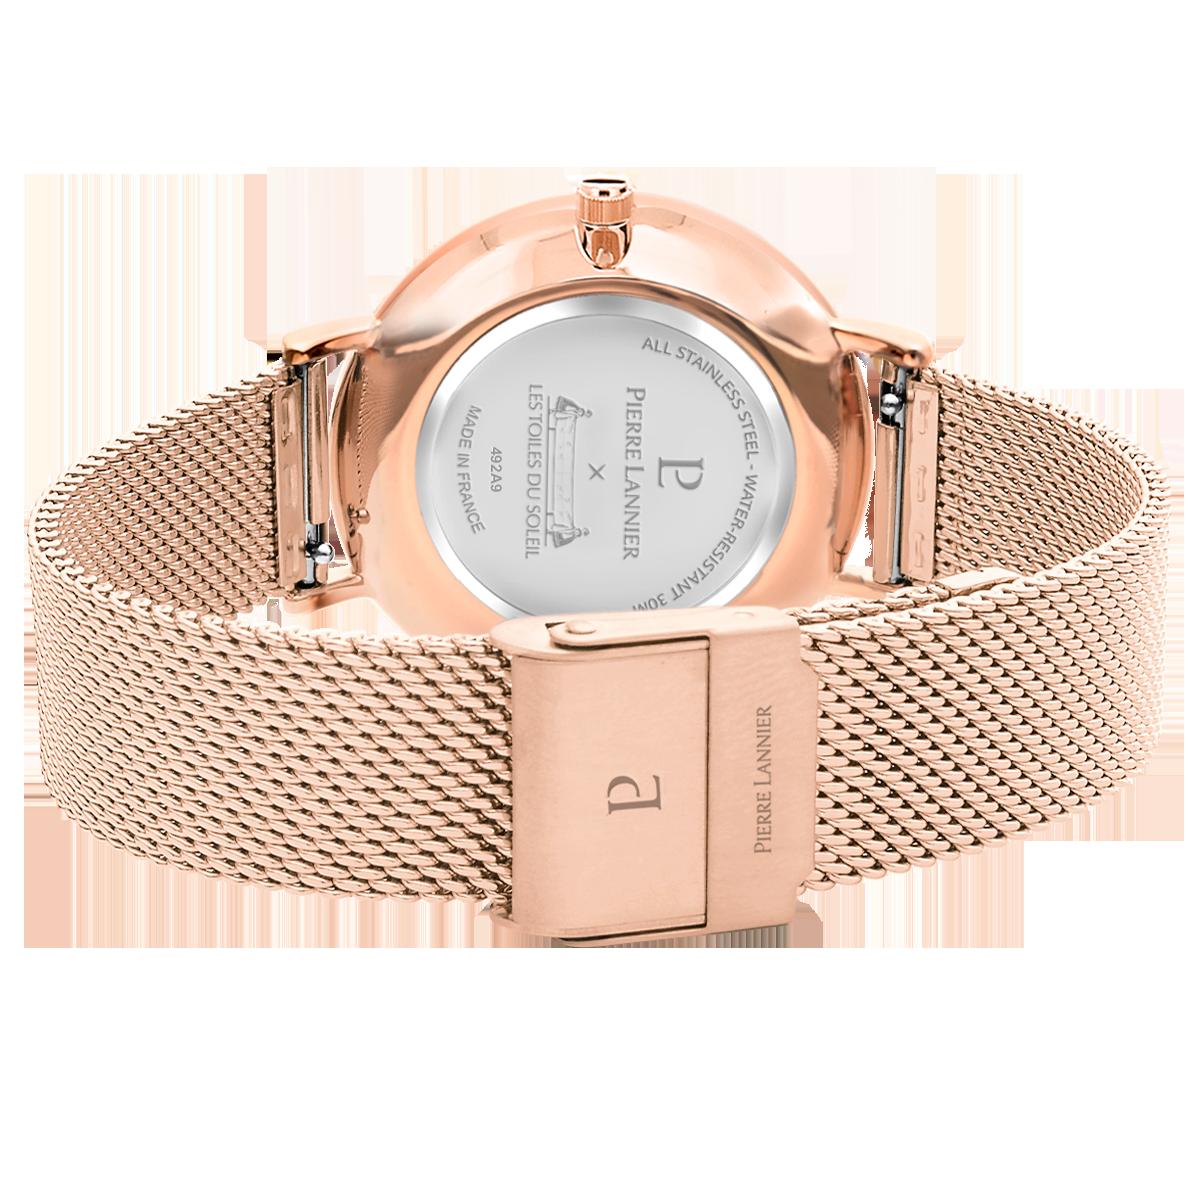 Женские часы Pierre Lannier Catalane Box 388B928